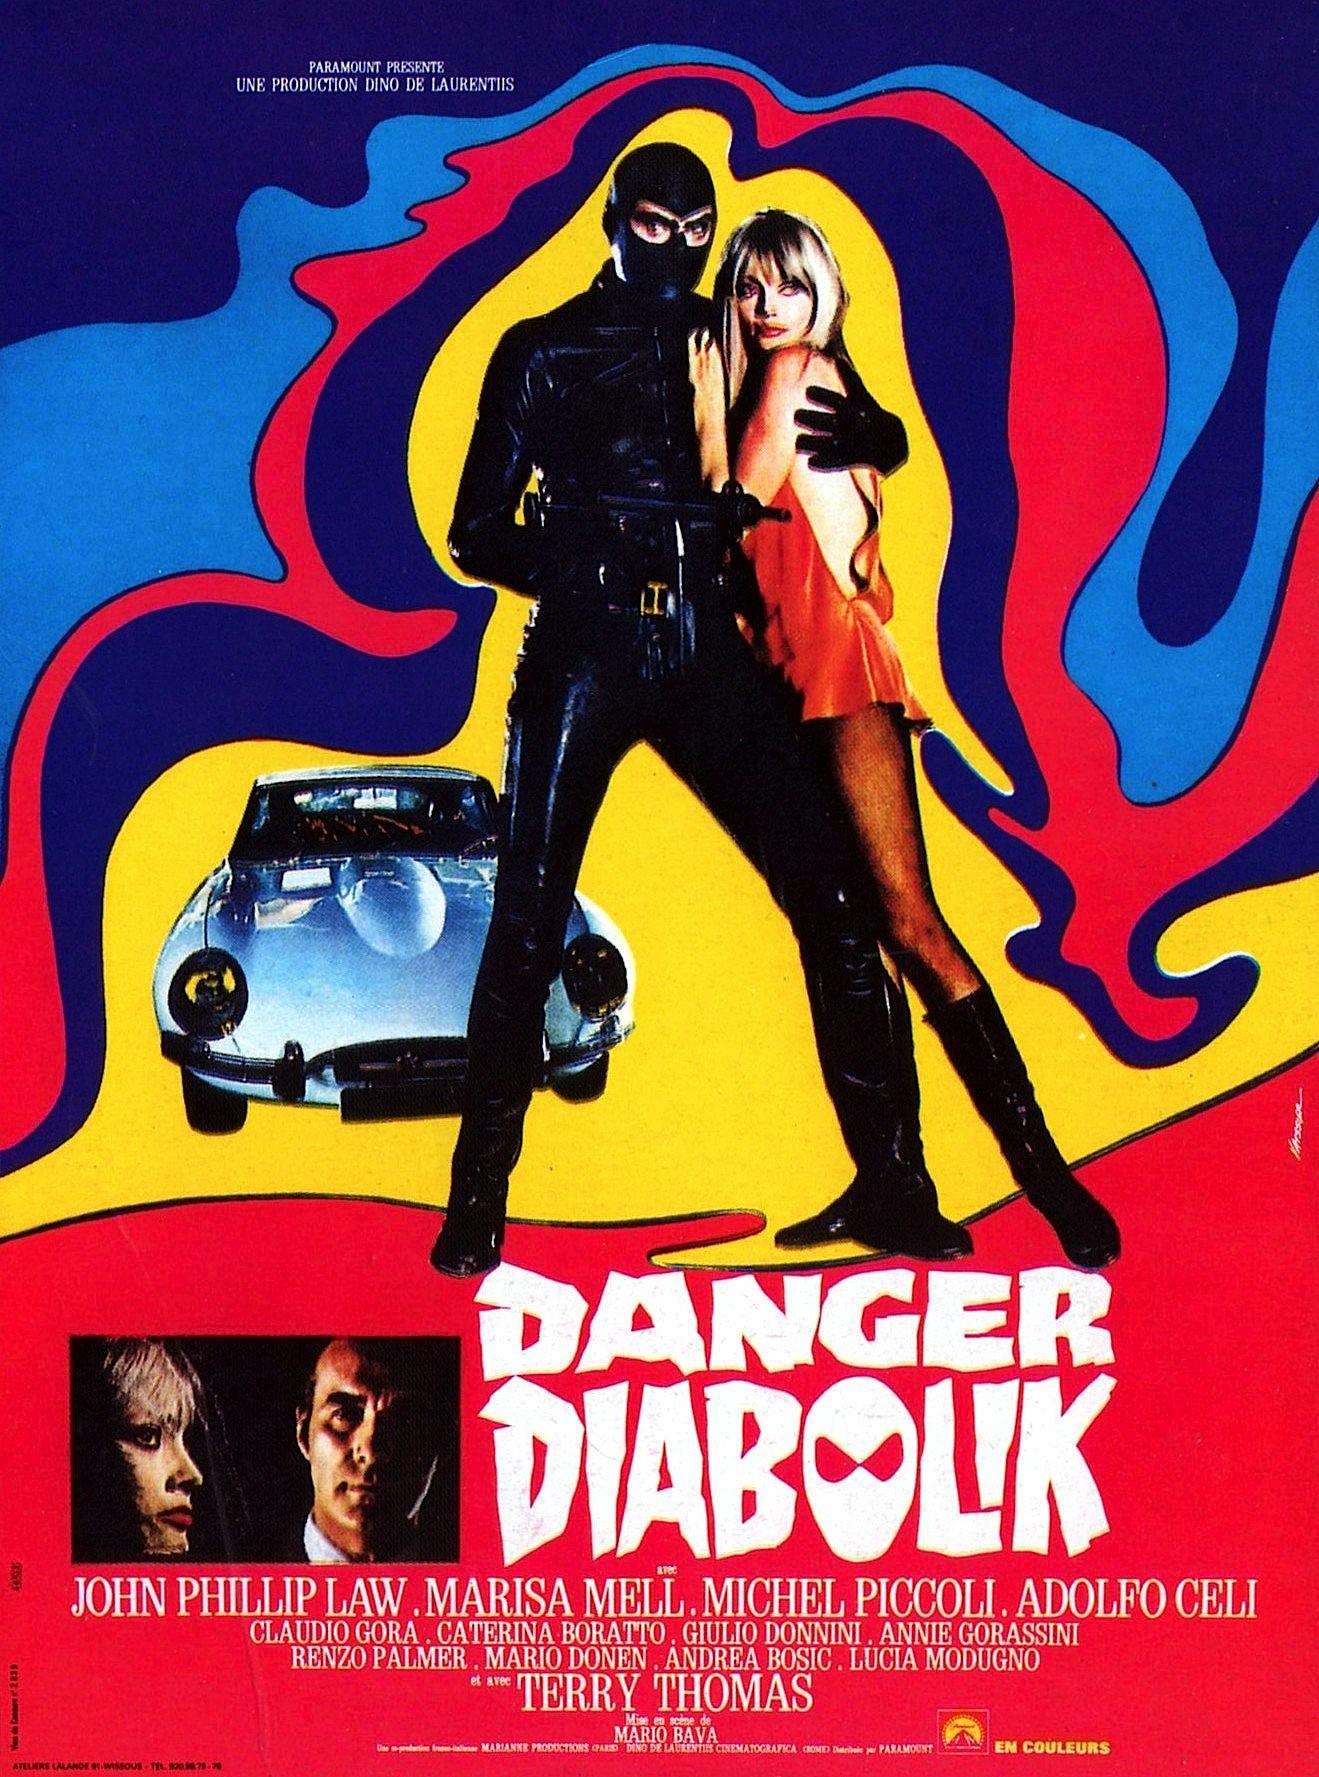 marisa_mell_eva_kant_danger_diabolik_poster